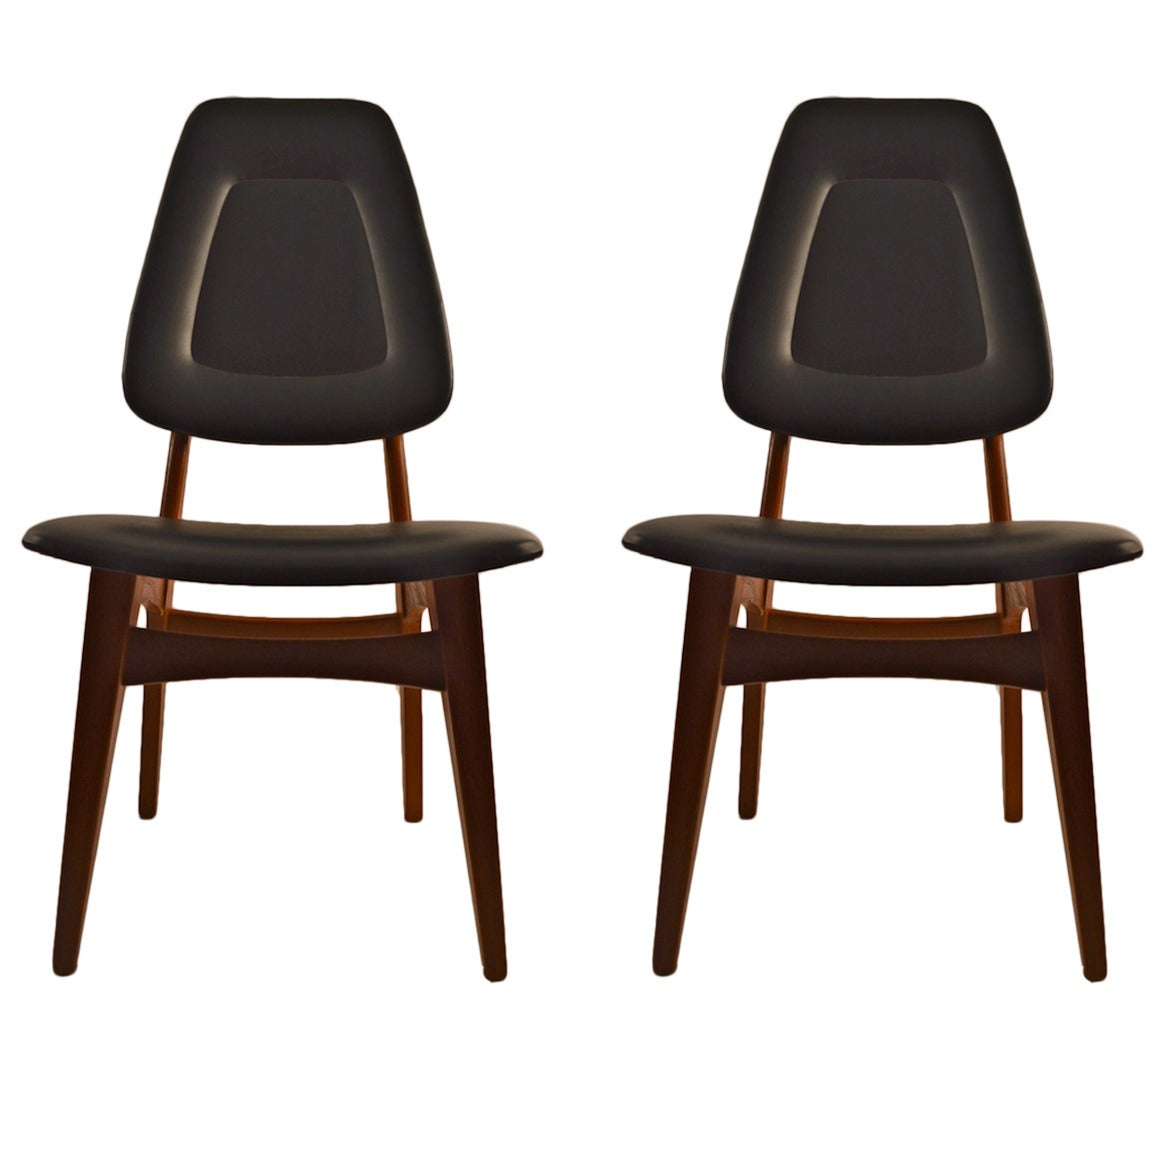 Pair of norwegian side chairs in teak for sale at 1stdibs for Side chairs for sale